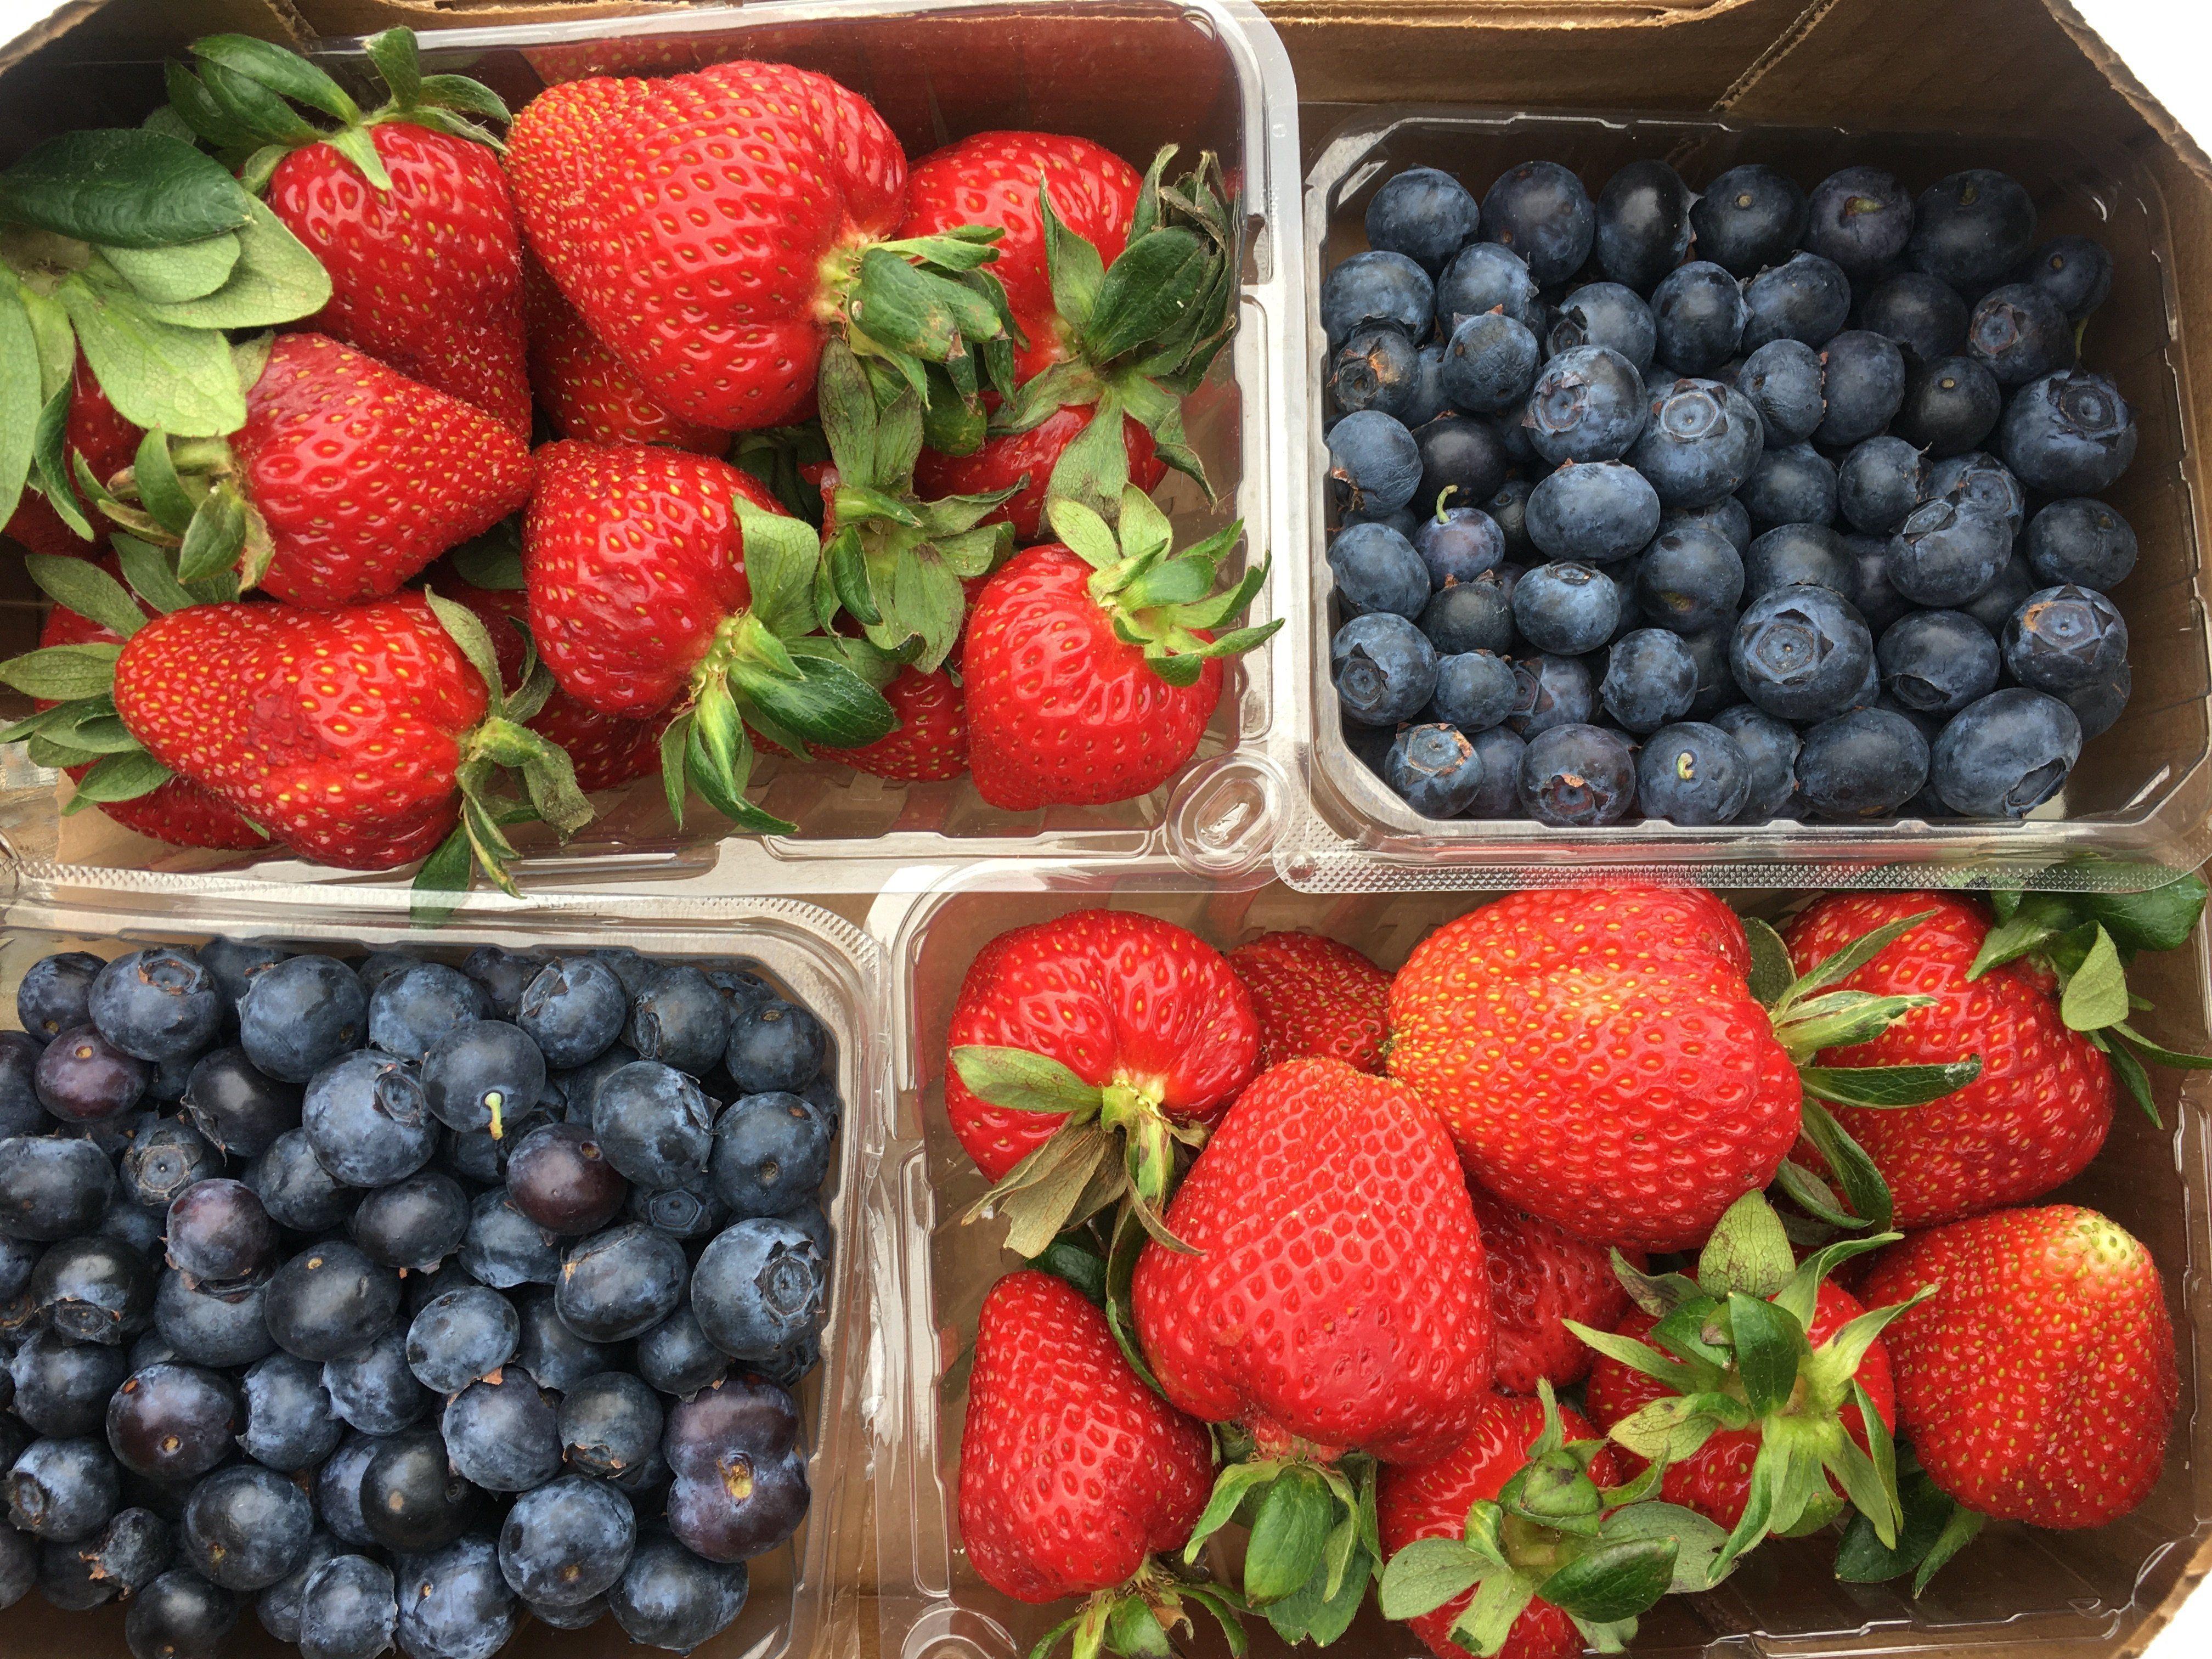 Regional Berry Farm Realities... Yes, Mold Happens